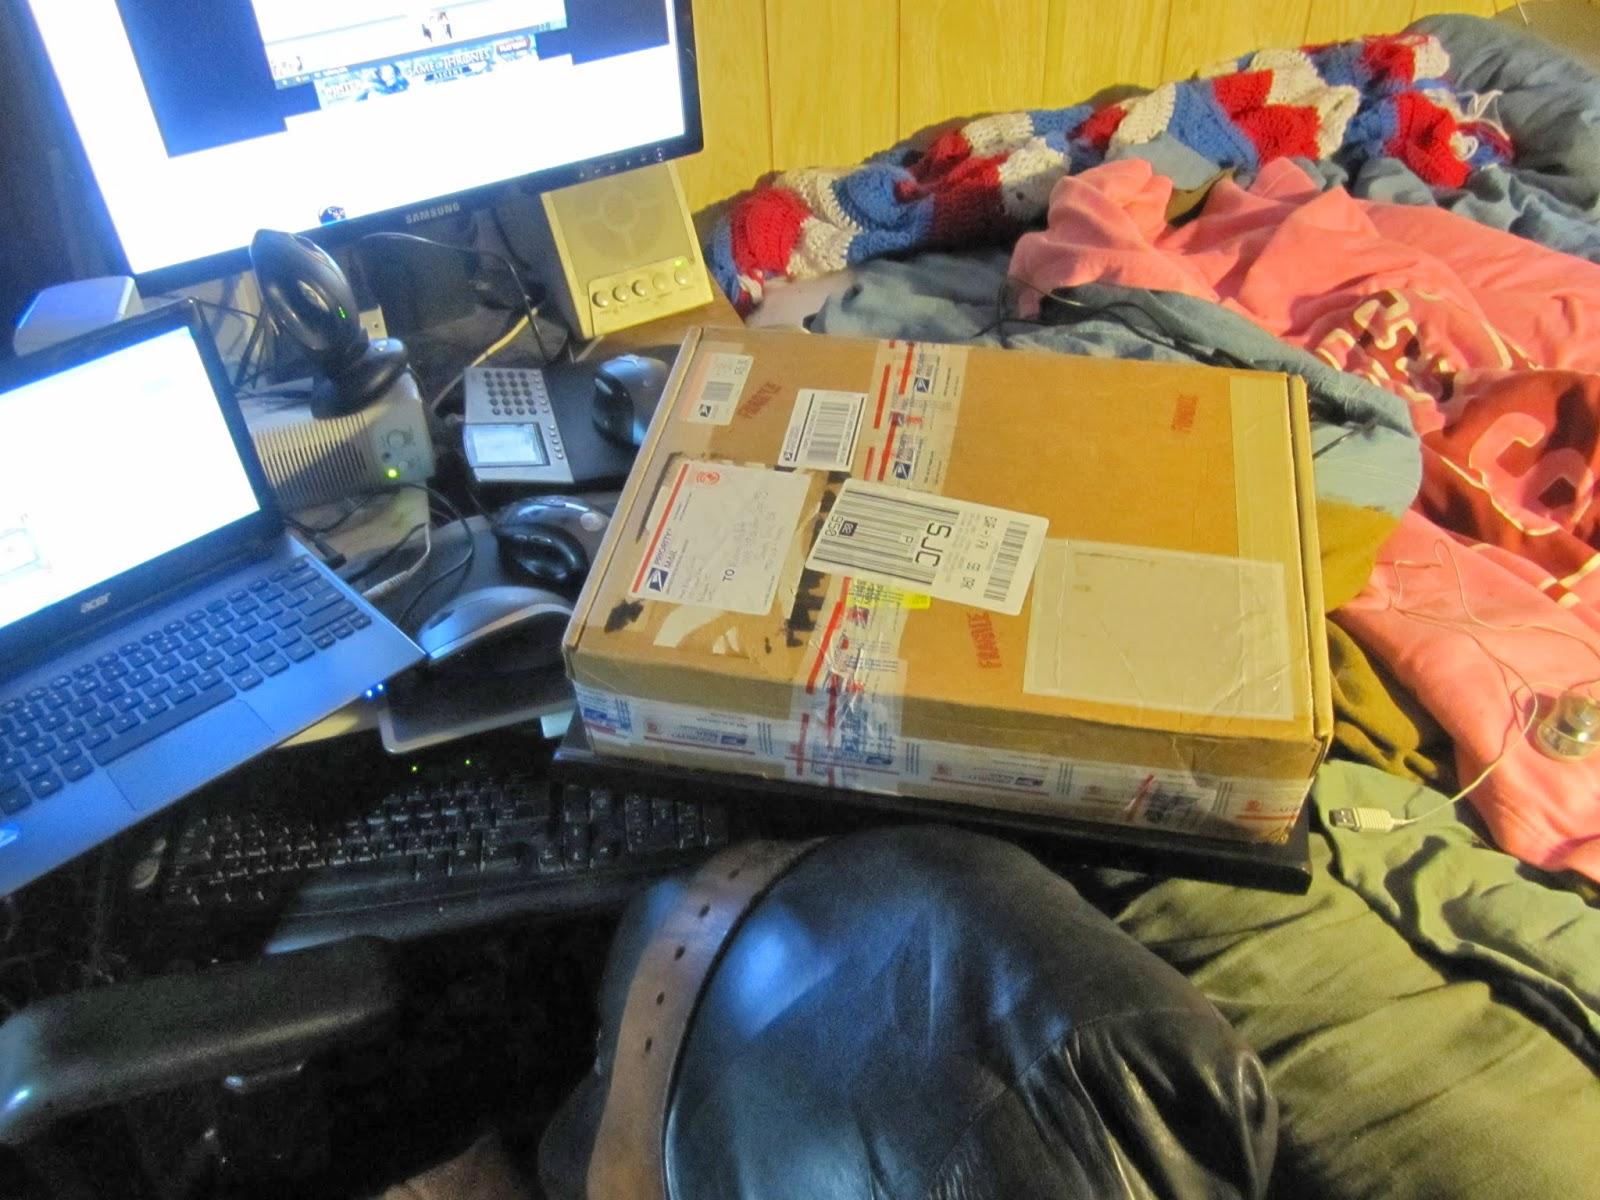 Fujitsu Lifebook T5010 Arrived | Fine Oils